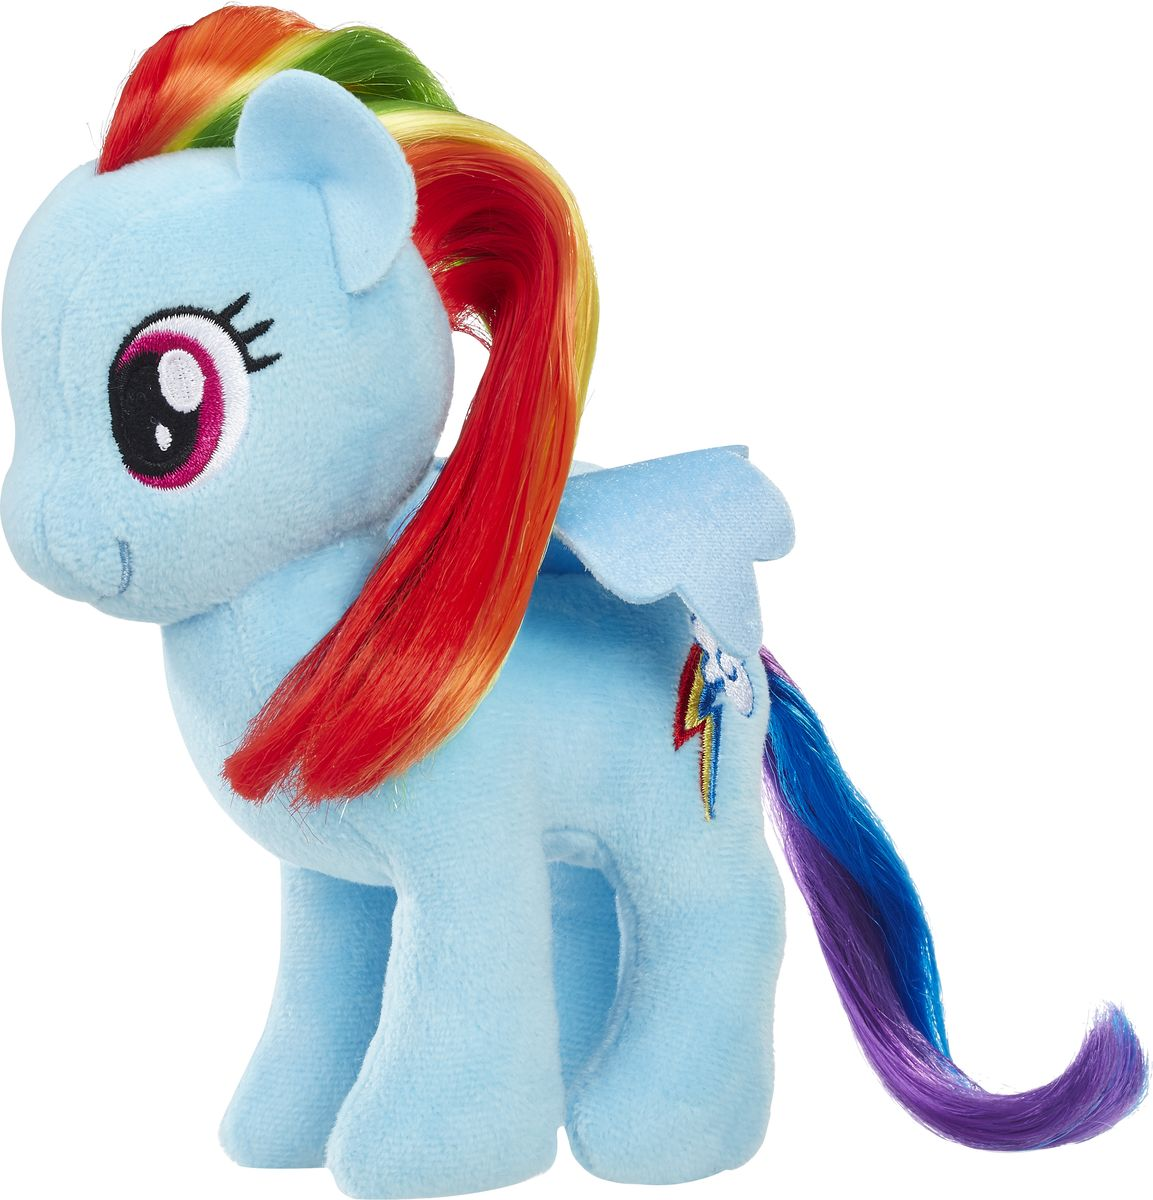 My Little Pony Мягкая игрушка Пони с волосами Rainbow Dash 19 см